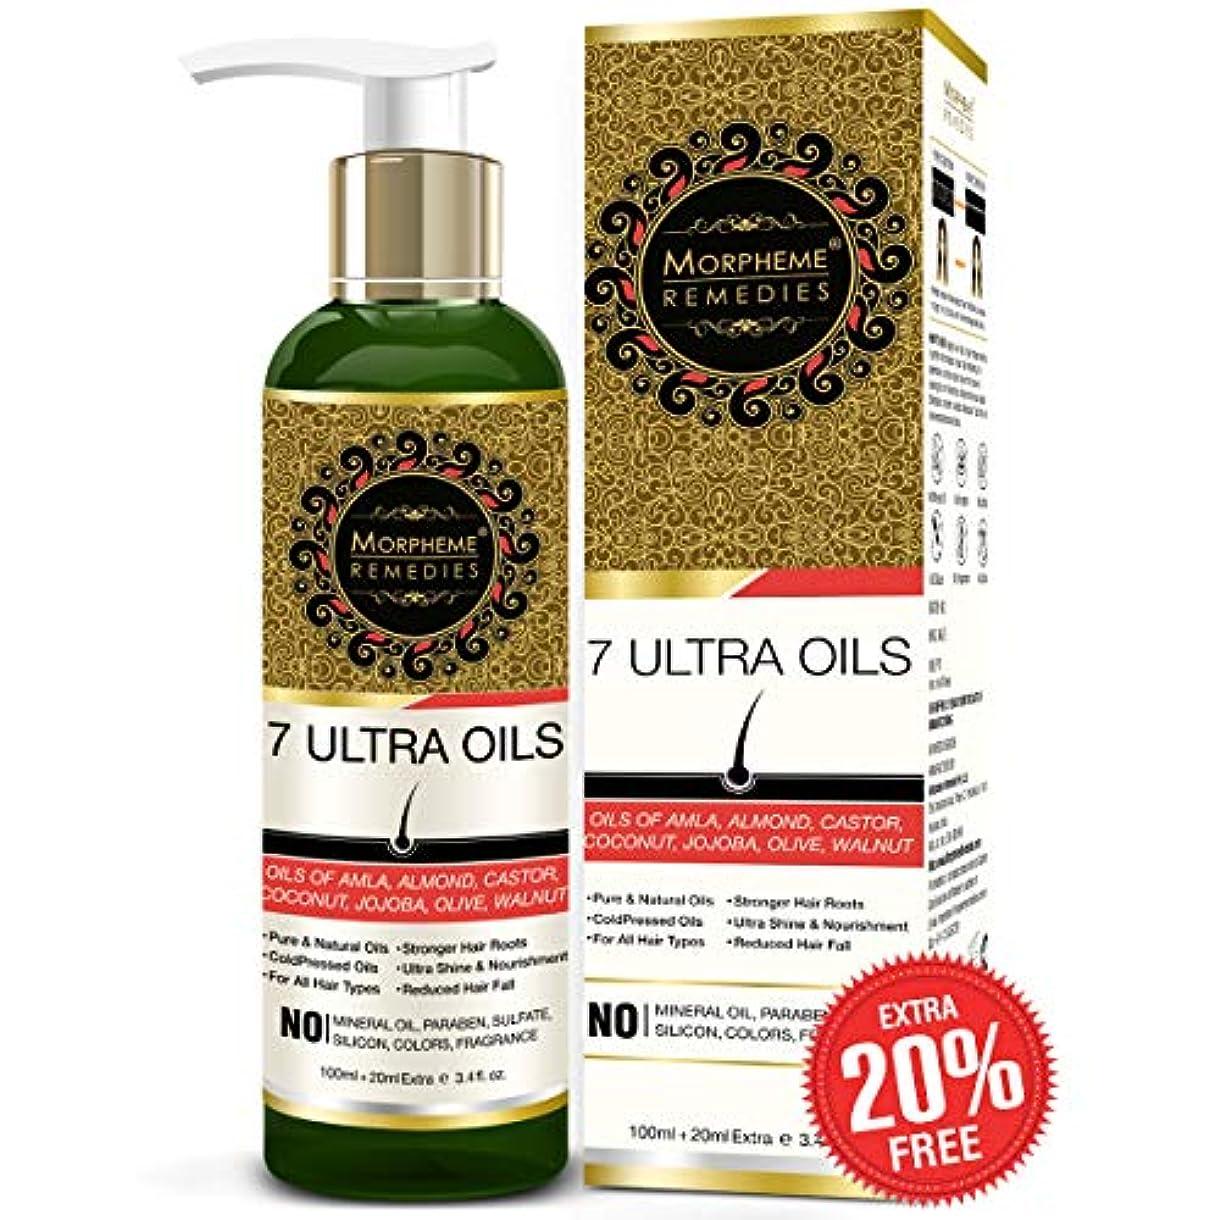 抽選厚い啓示Morpheme Remedies 7 Ultra Hair Oil - (Almond, Castor, Jojoba, Coconut, Olive, Walnut, Amla Oils) - 120 ml